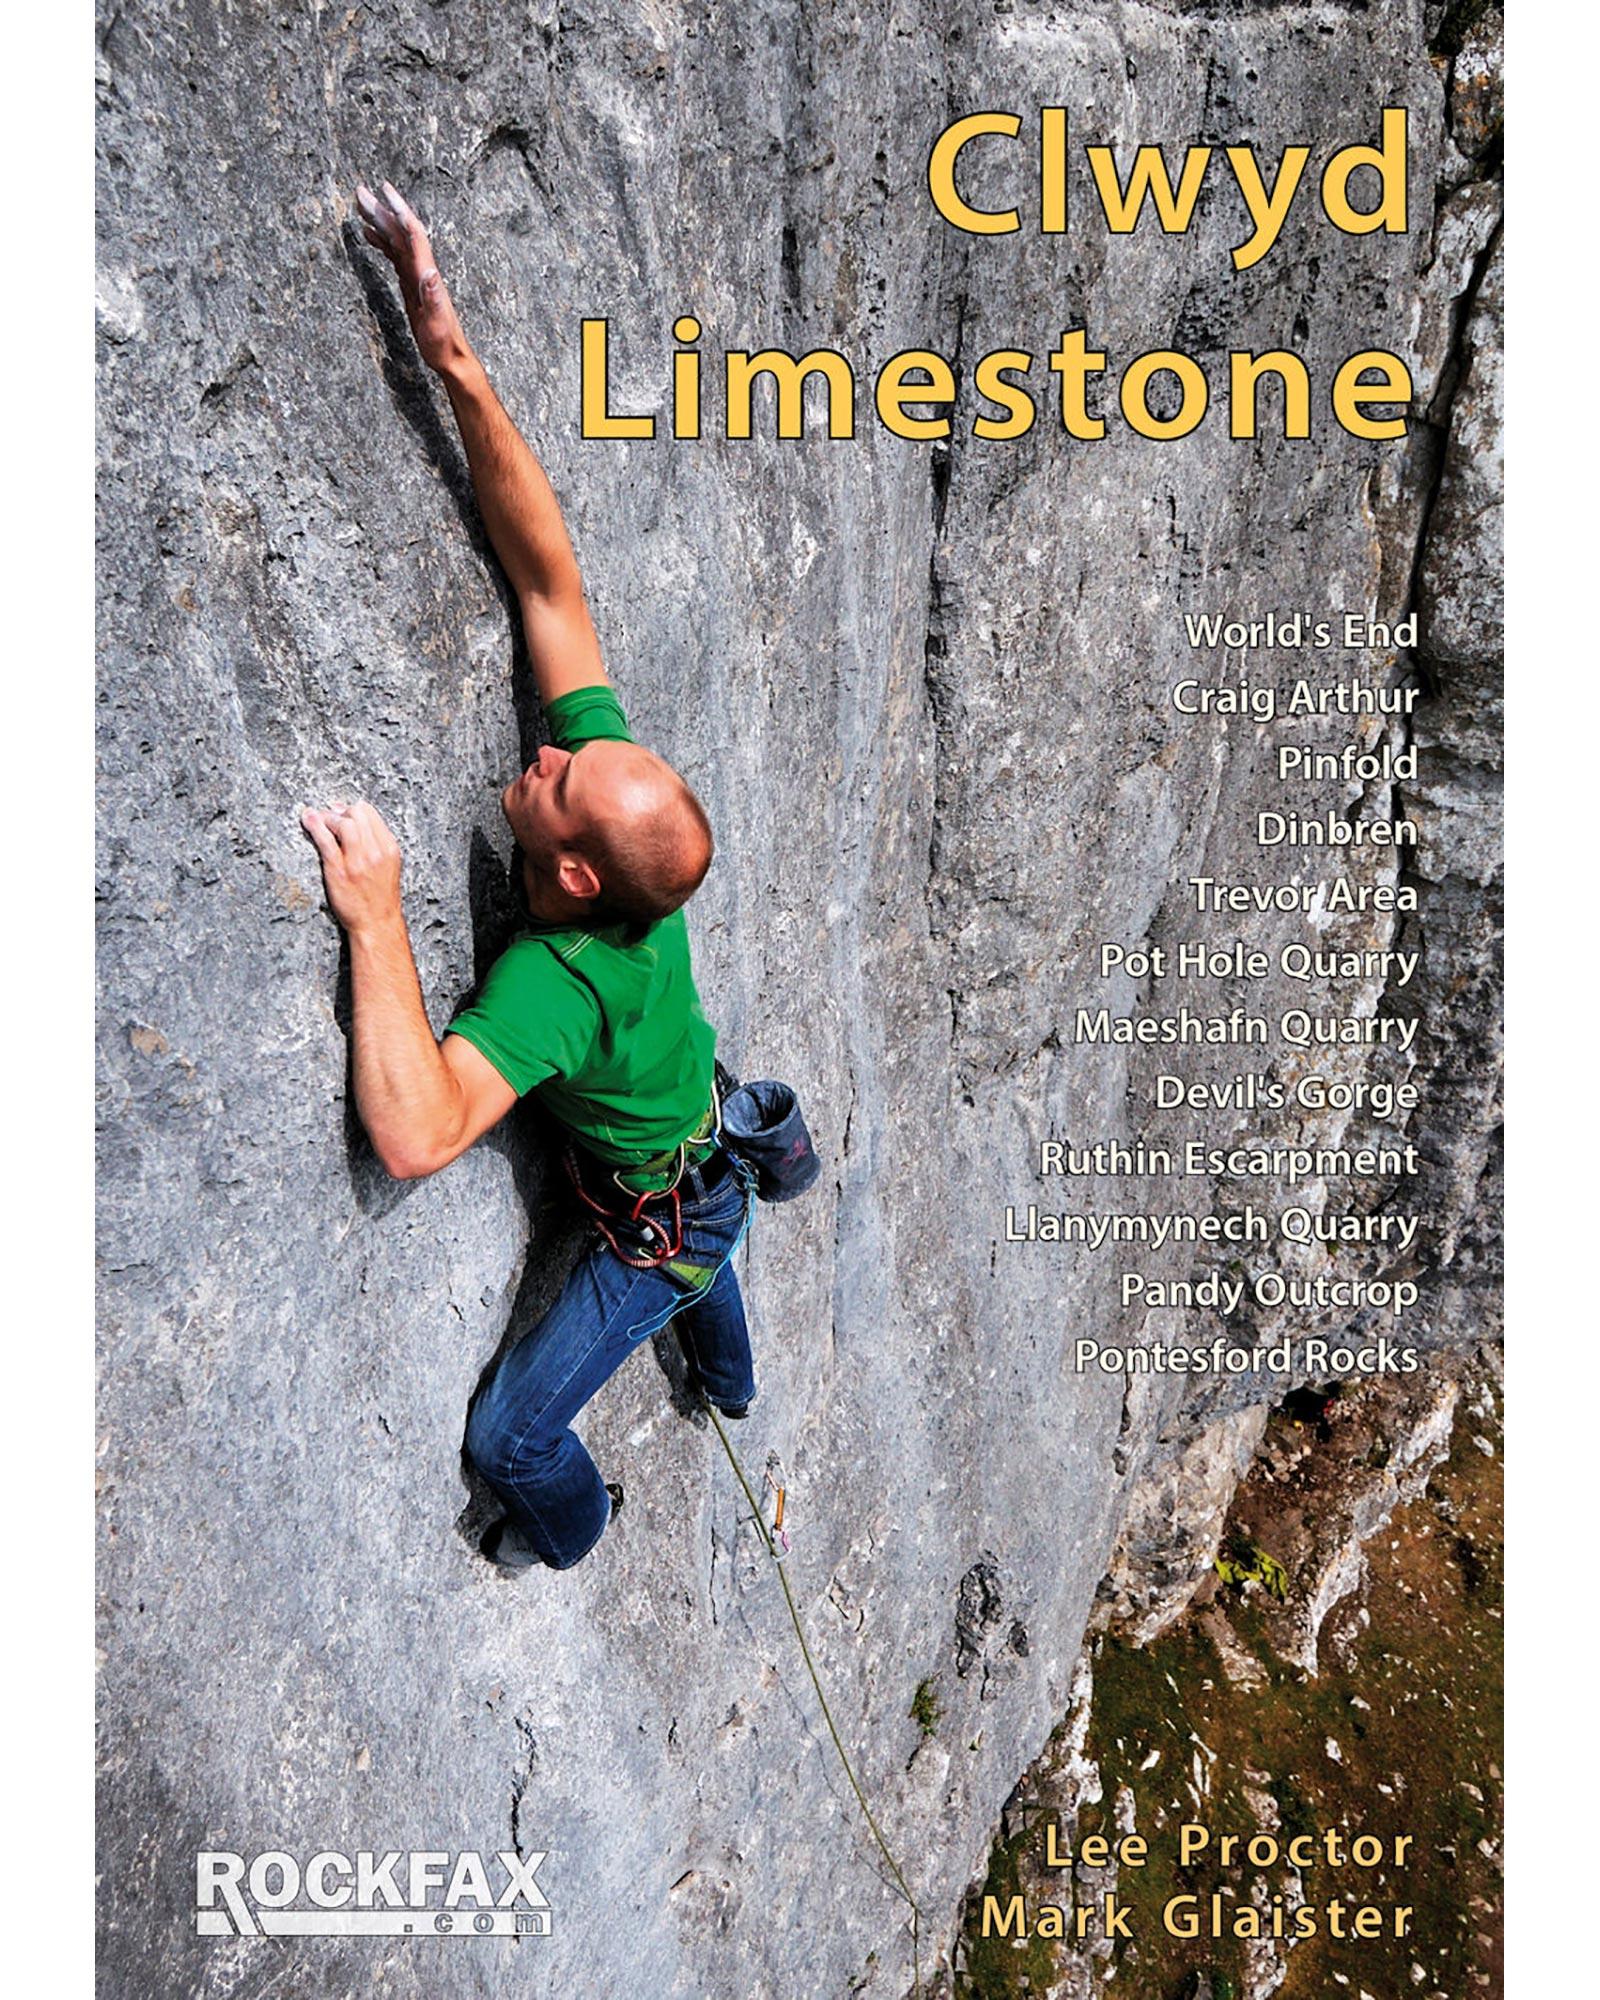 Rockfax Clwyd Limestone Rockfax Guide Book